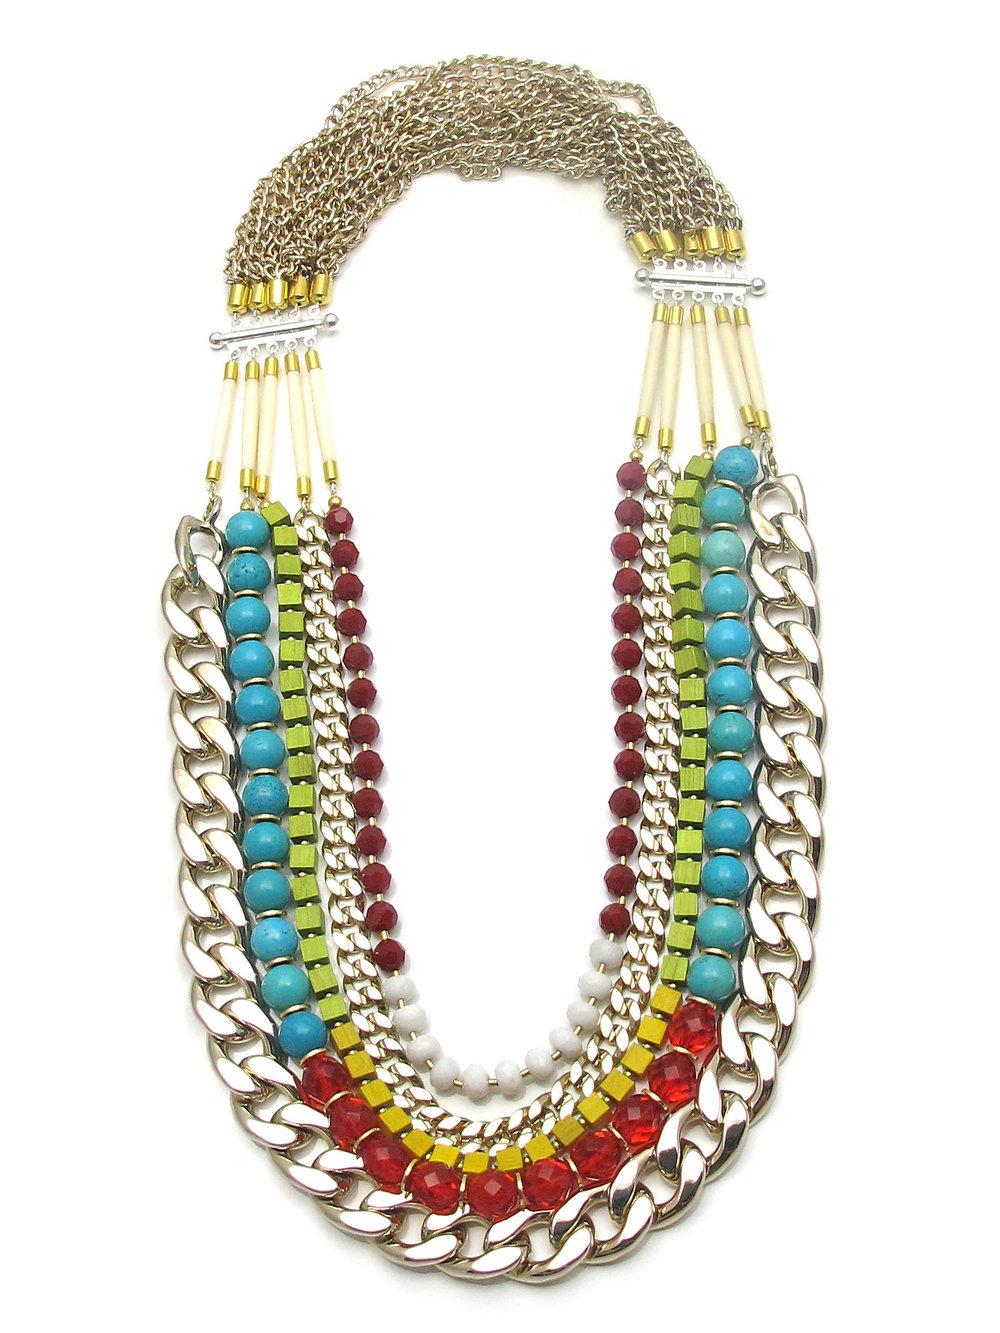 001 5-strand Necklace.jpg